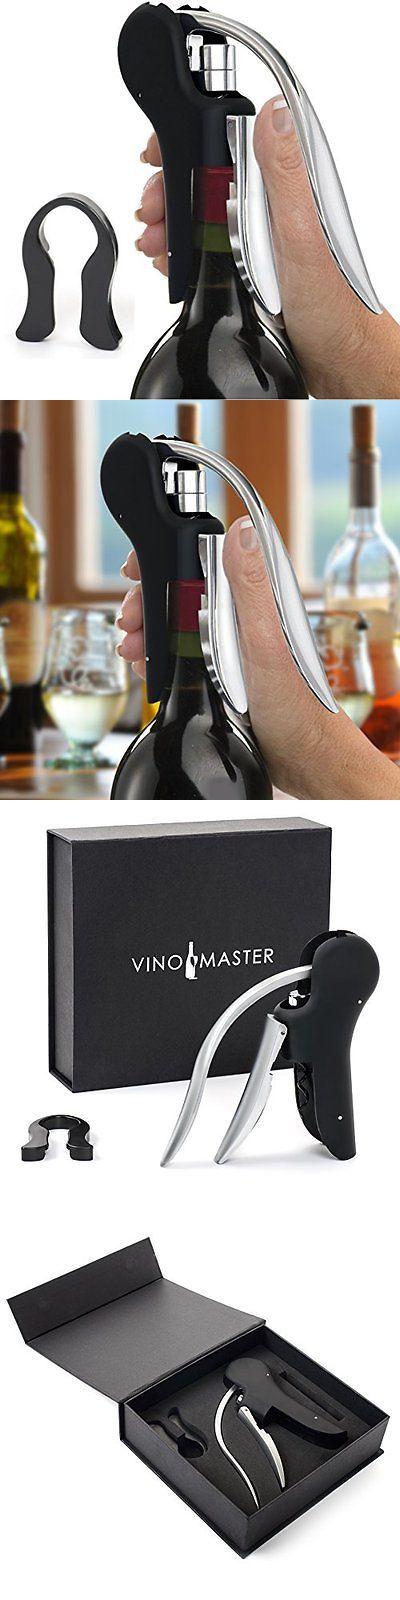 Corkscrews and Openers 20688: Vinomaster Wine Bottle Lever Screwpull Opener Gift Set - Best Rabbit-Style Corks -> BUY IT NOW ONLY: $80.15 on eBay!